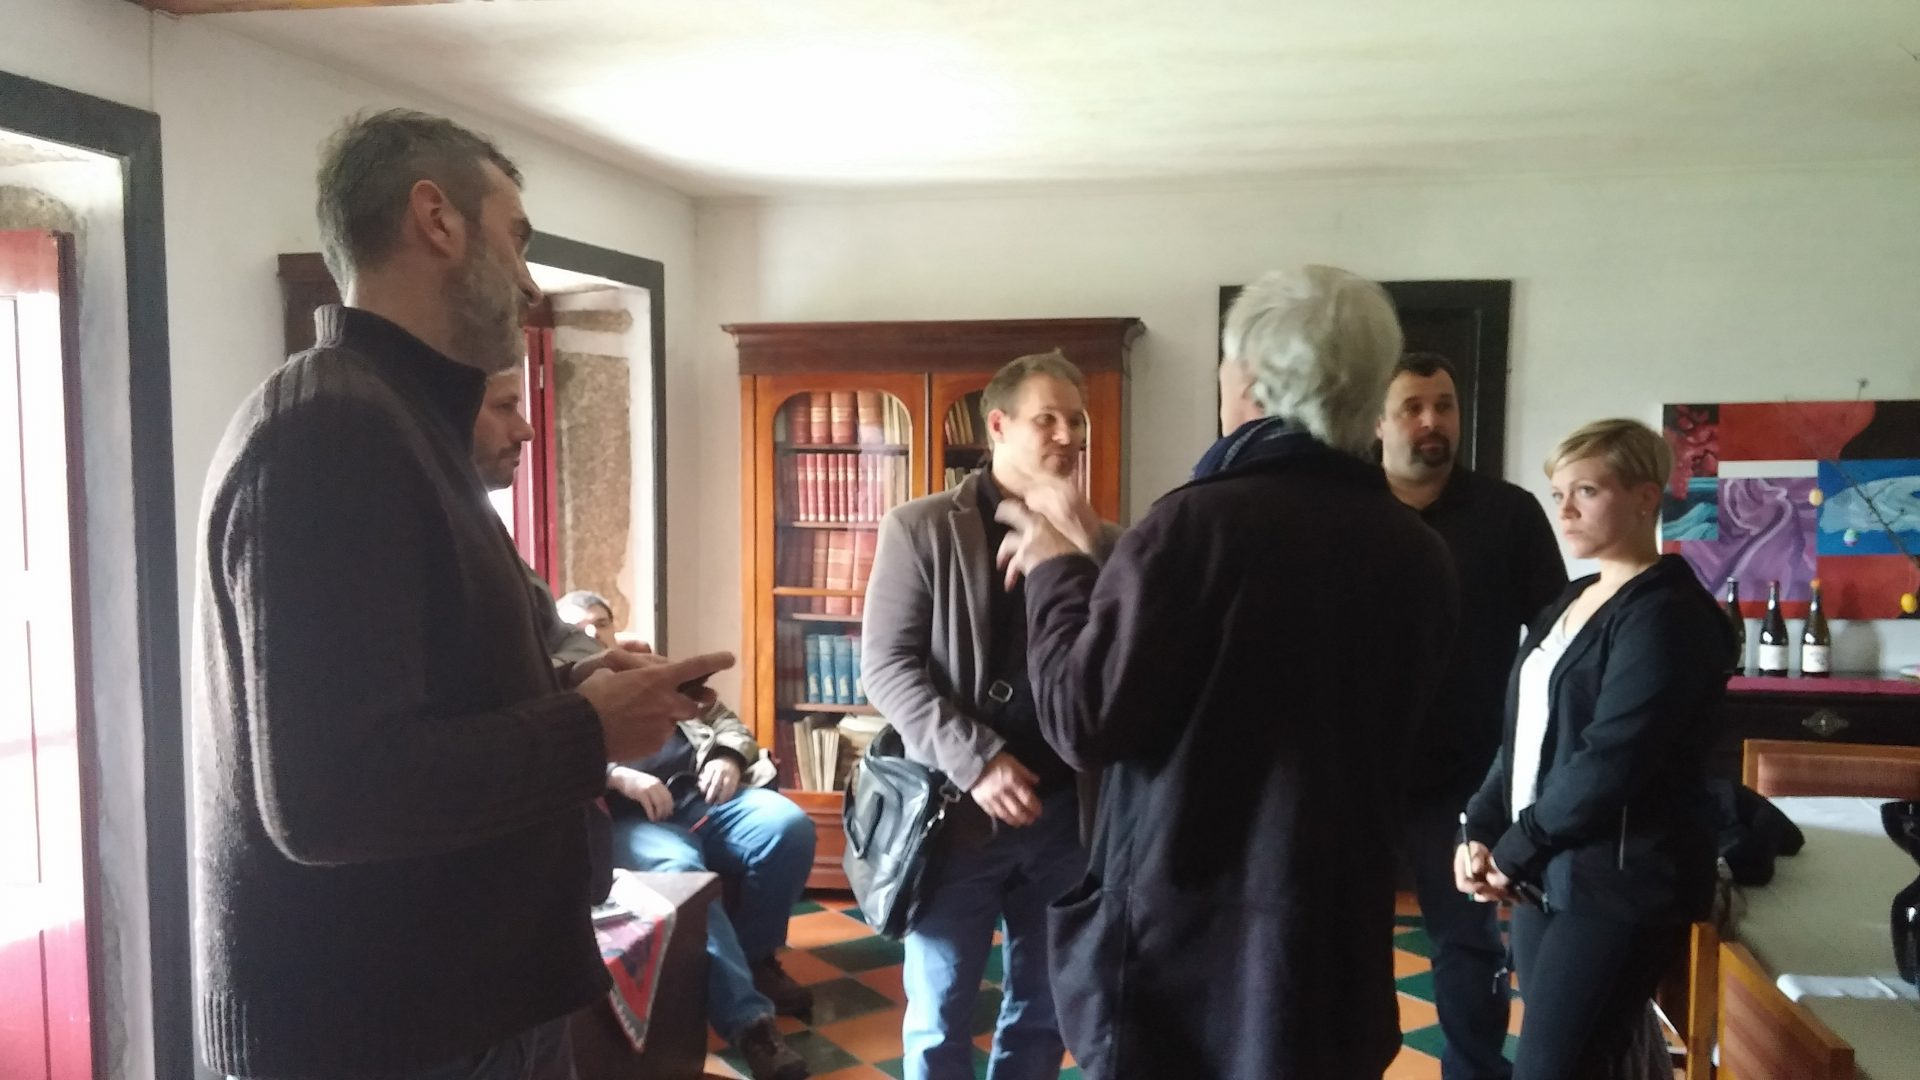 Le Sorcier weaving a spell (L-R Anton Potvin, somm; Michael Godel, writer; seated Michael PIinkus, writer; Drew Innes, writer; Gandalf; Evan Saviolidis, writer; Émilie Courtois, somm)